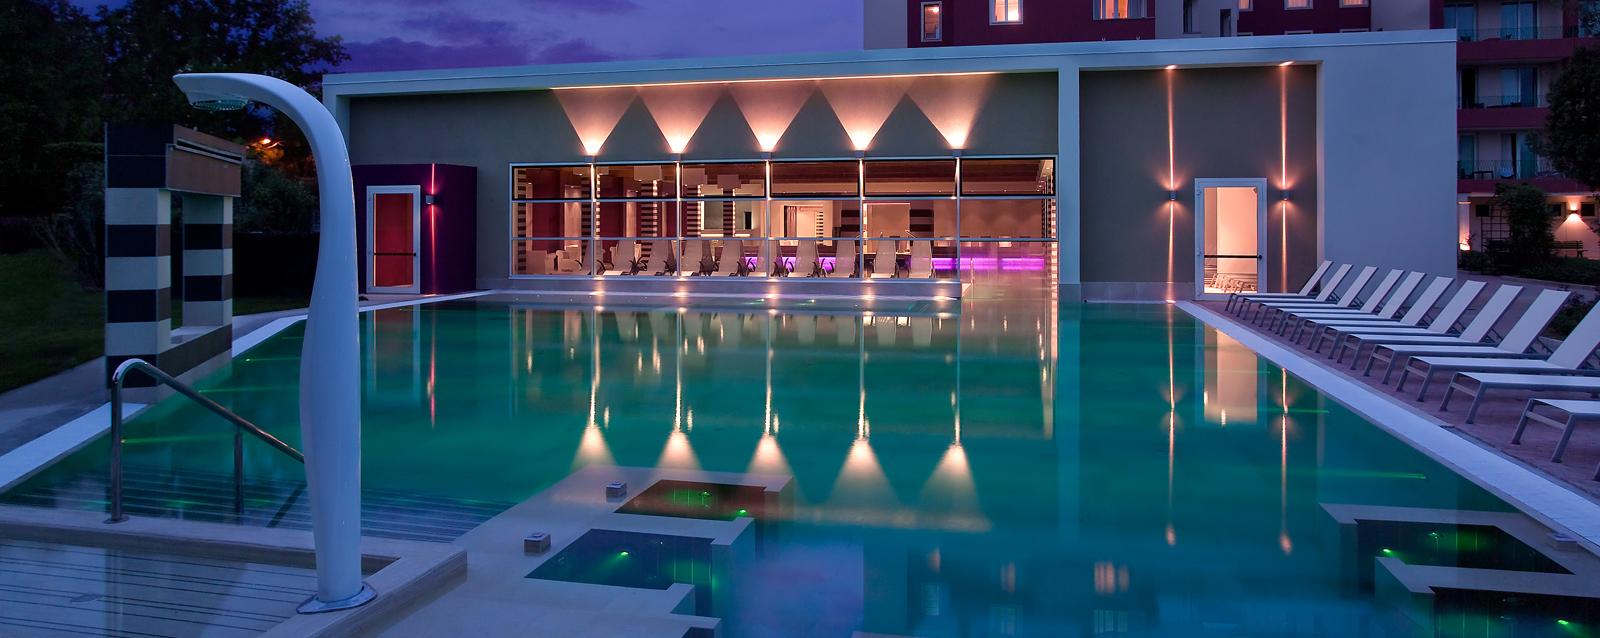 The Veranda and pool a dusk